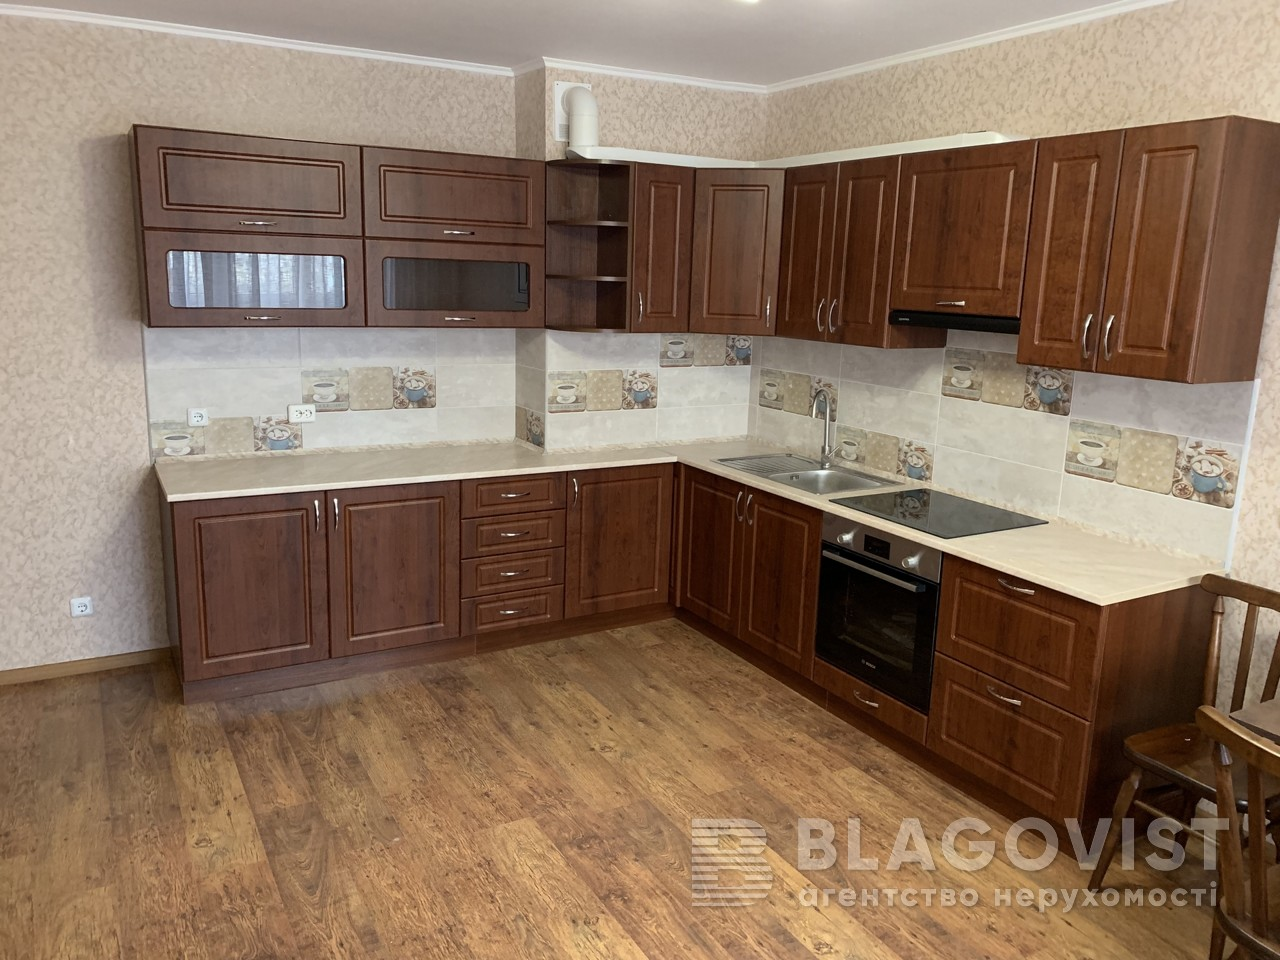 Квартира R-24472, Ясиноватский пер., 11, Киев - Фото 8